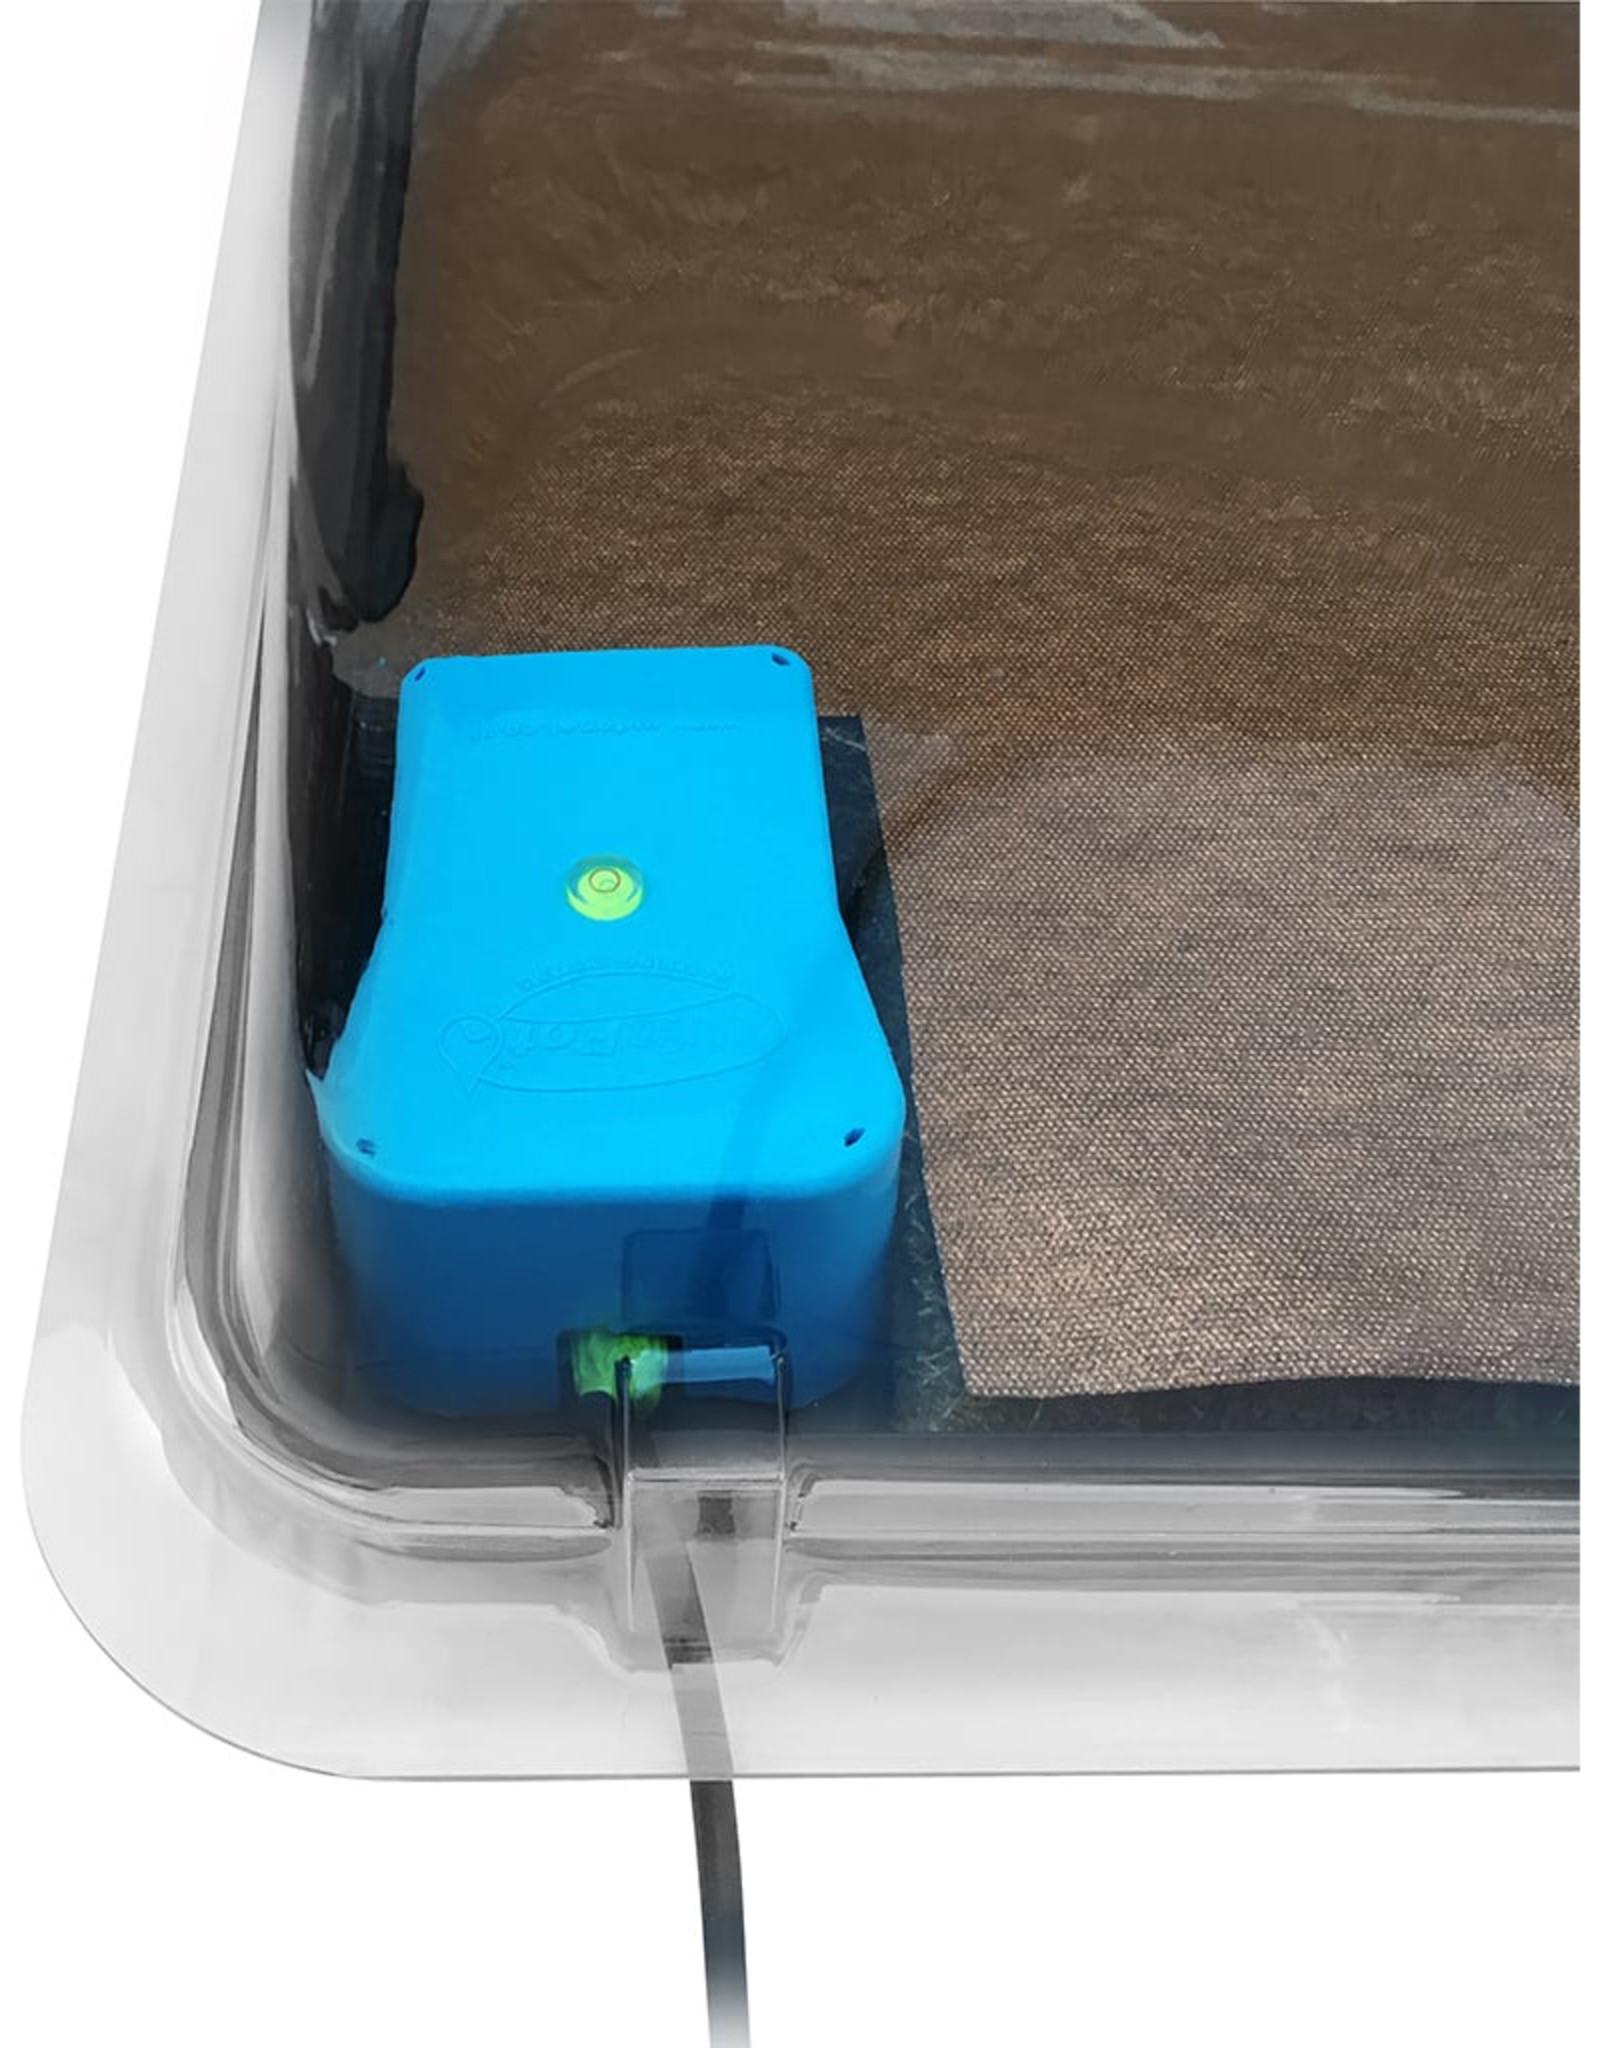 Autopot Autopot Easy 2 Propagate - Extension Kit